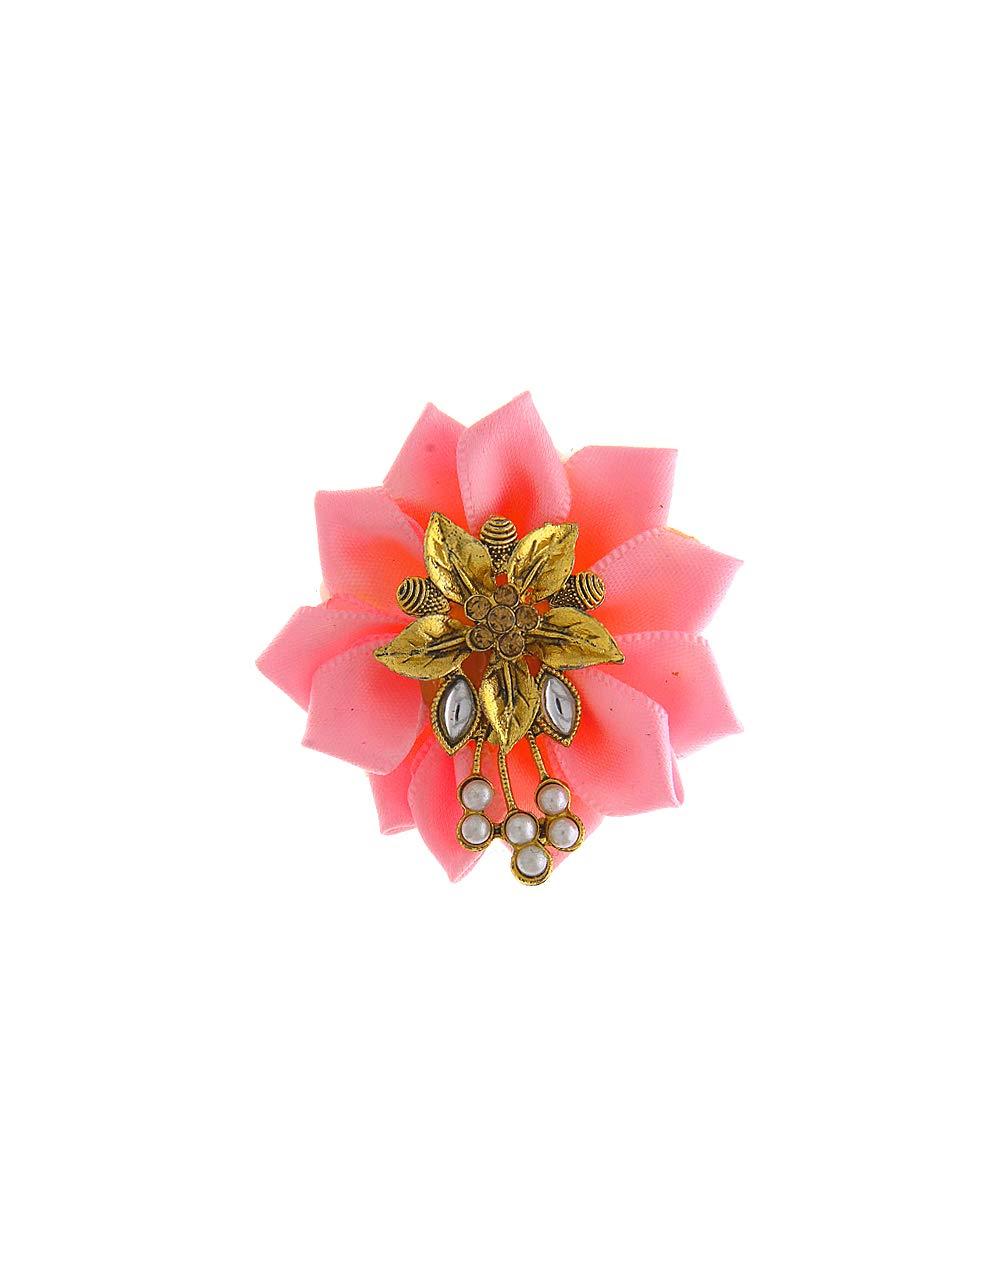 Anuradha Art Baby Pink Colour Styled with Flower Wonderful Designer Sari/Saree Pin for Women/Girls